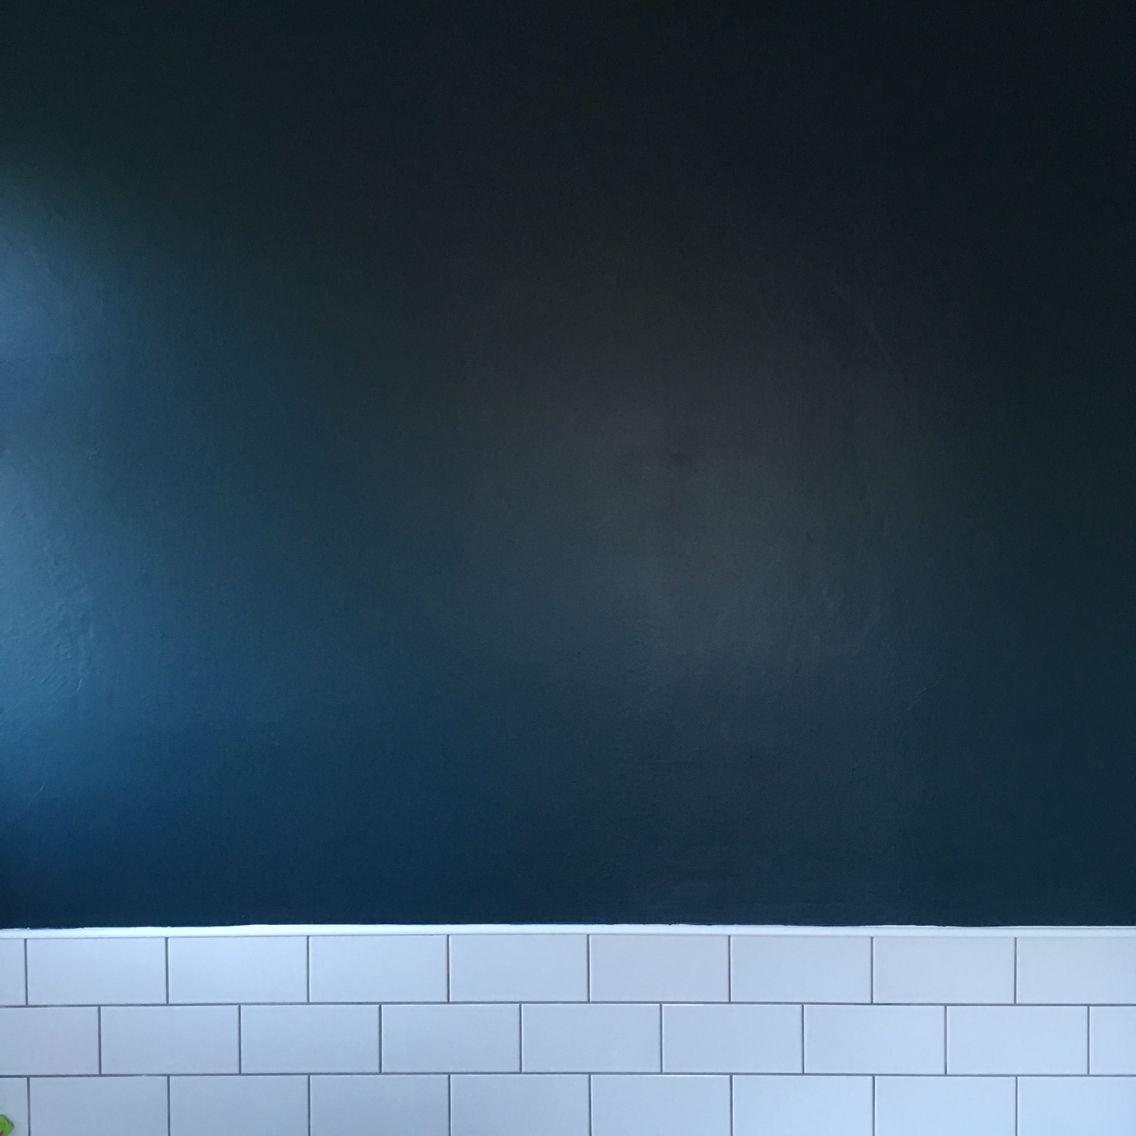 Farrow Ball Hague Blue White Tiles Blue Laundry Rooms White Bathroom Tiles Dark Blue Feature Wall